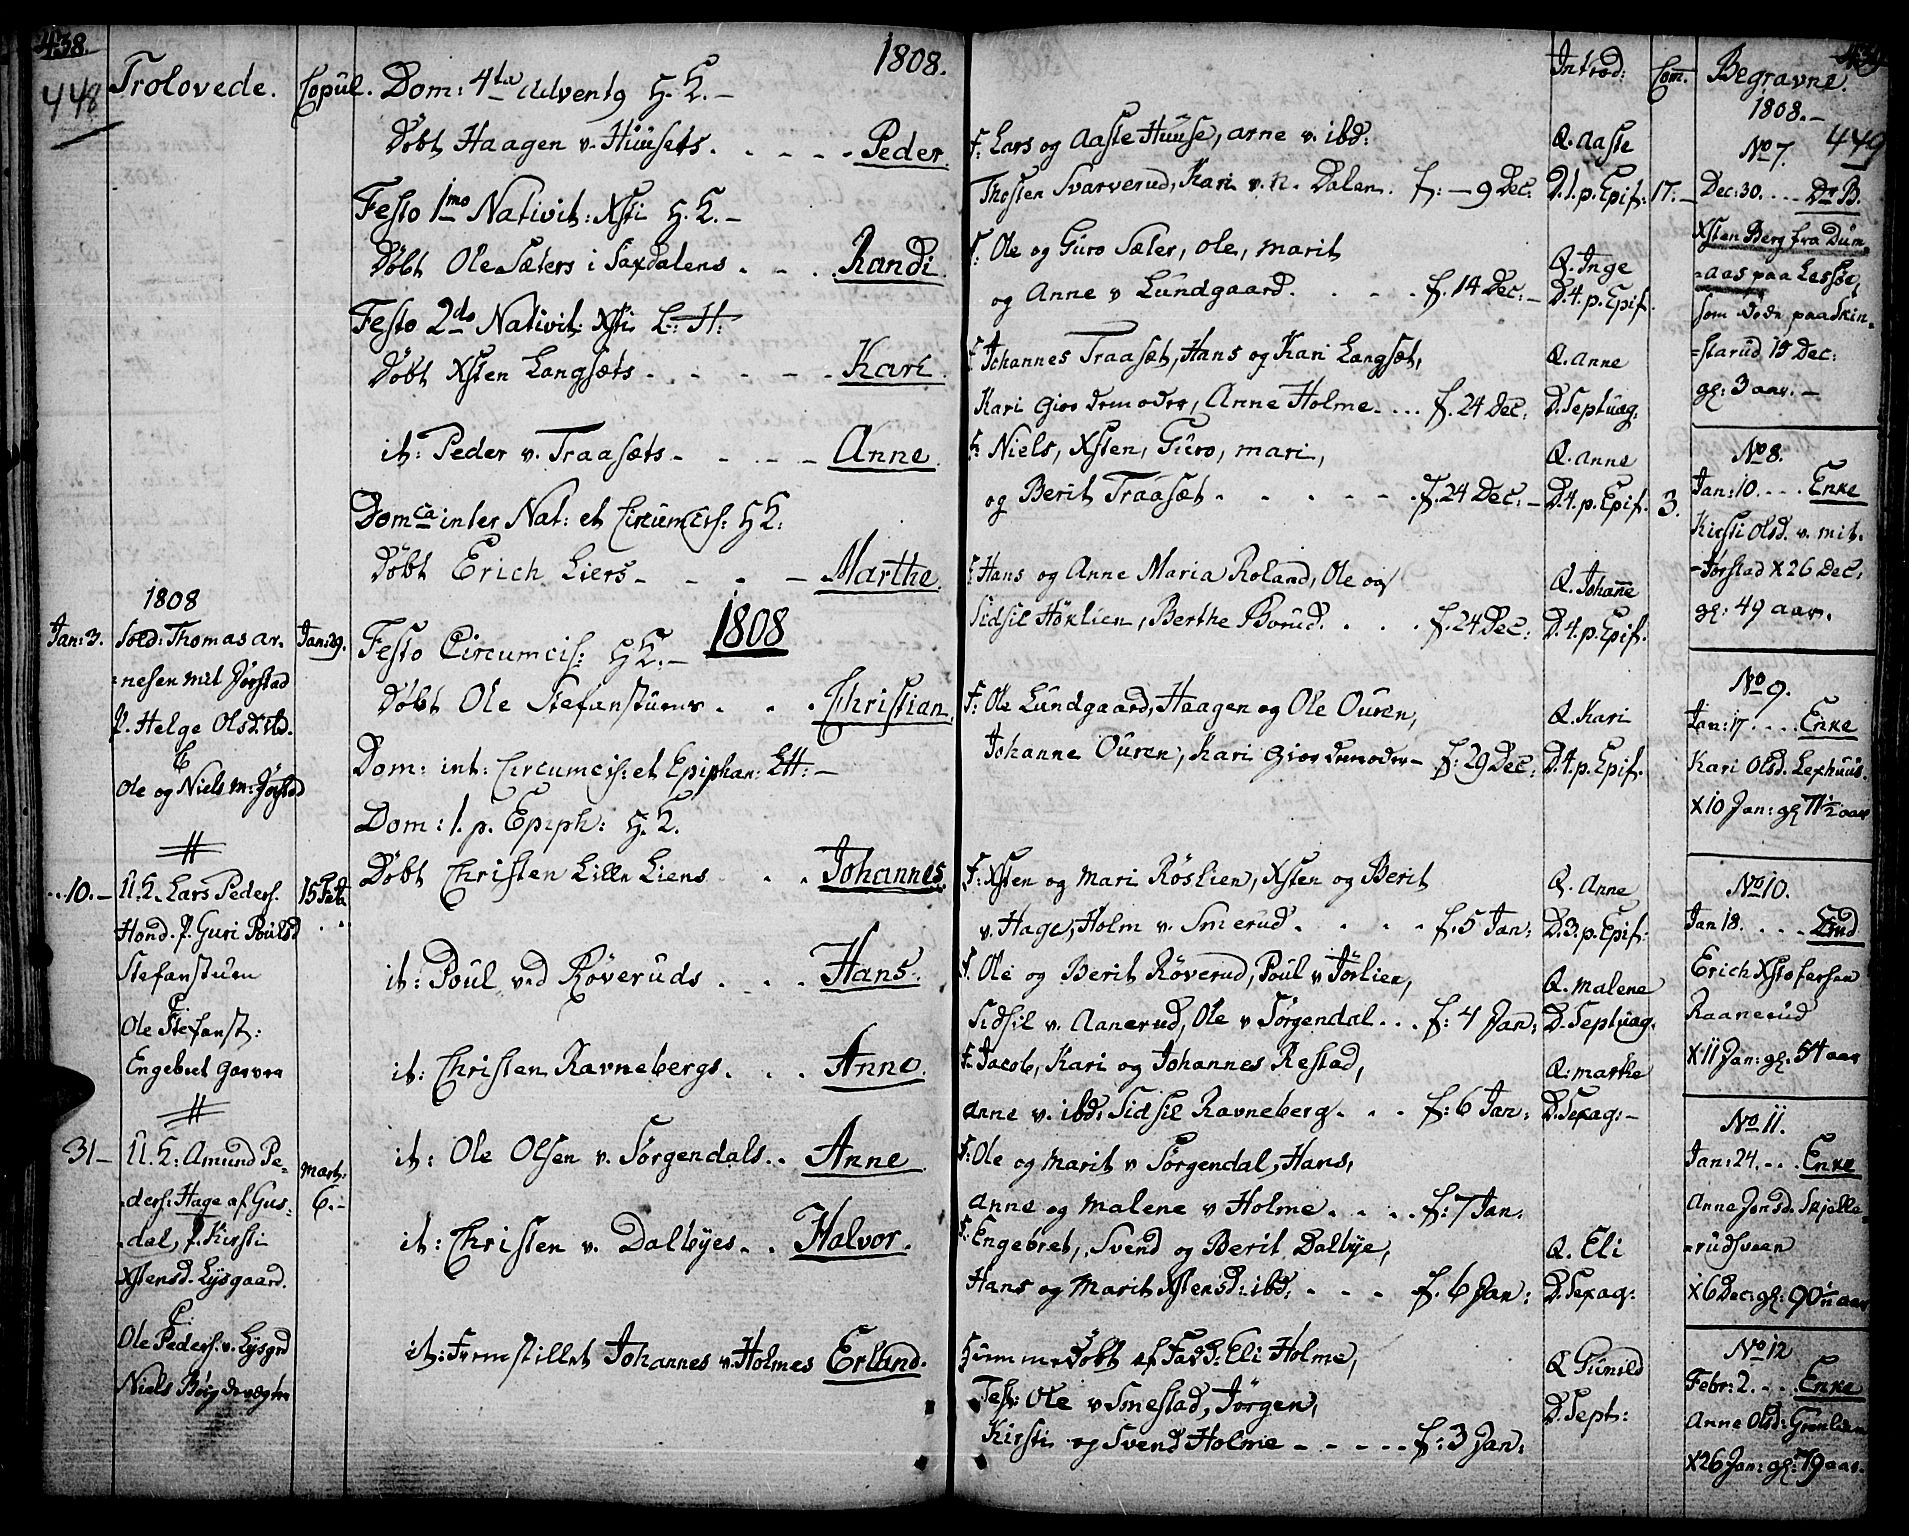 SAH, Fåberg prestekontor, Ministerialbok nr. 2, 1775-1818, s. 448-449